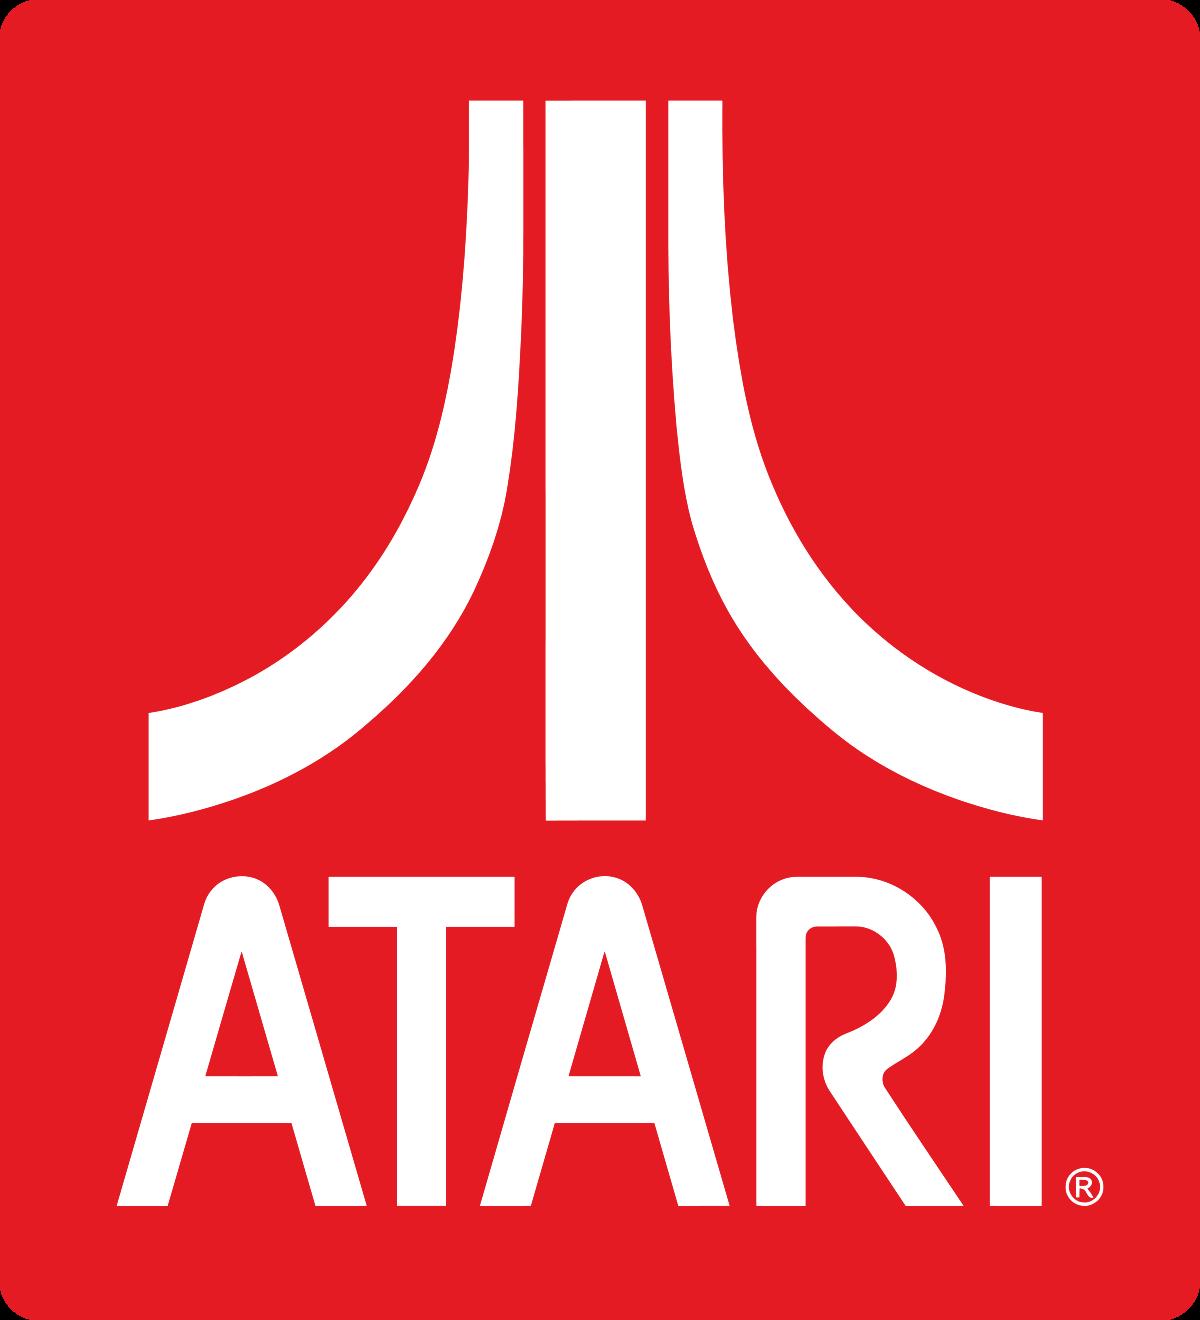 Atari - Wikipedia | Very Vintage | Game logo, Vintage video games